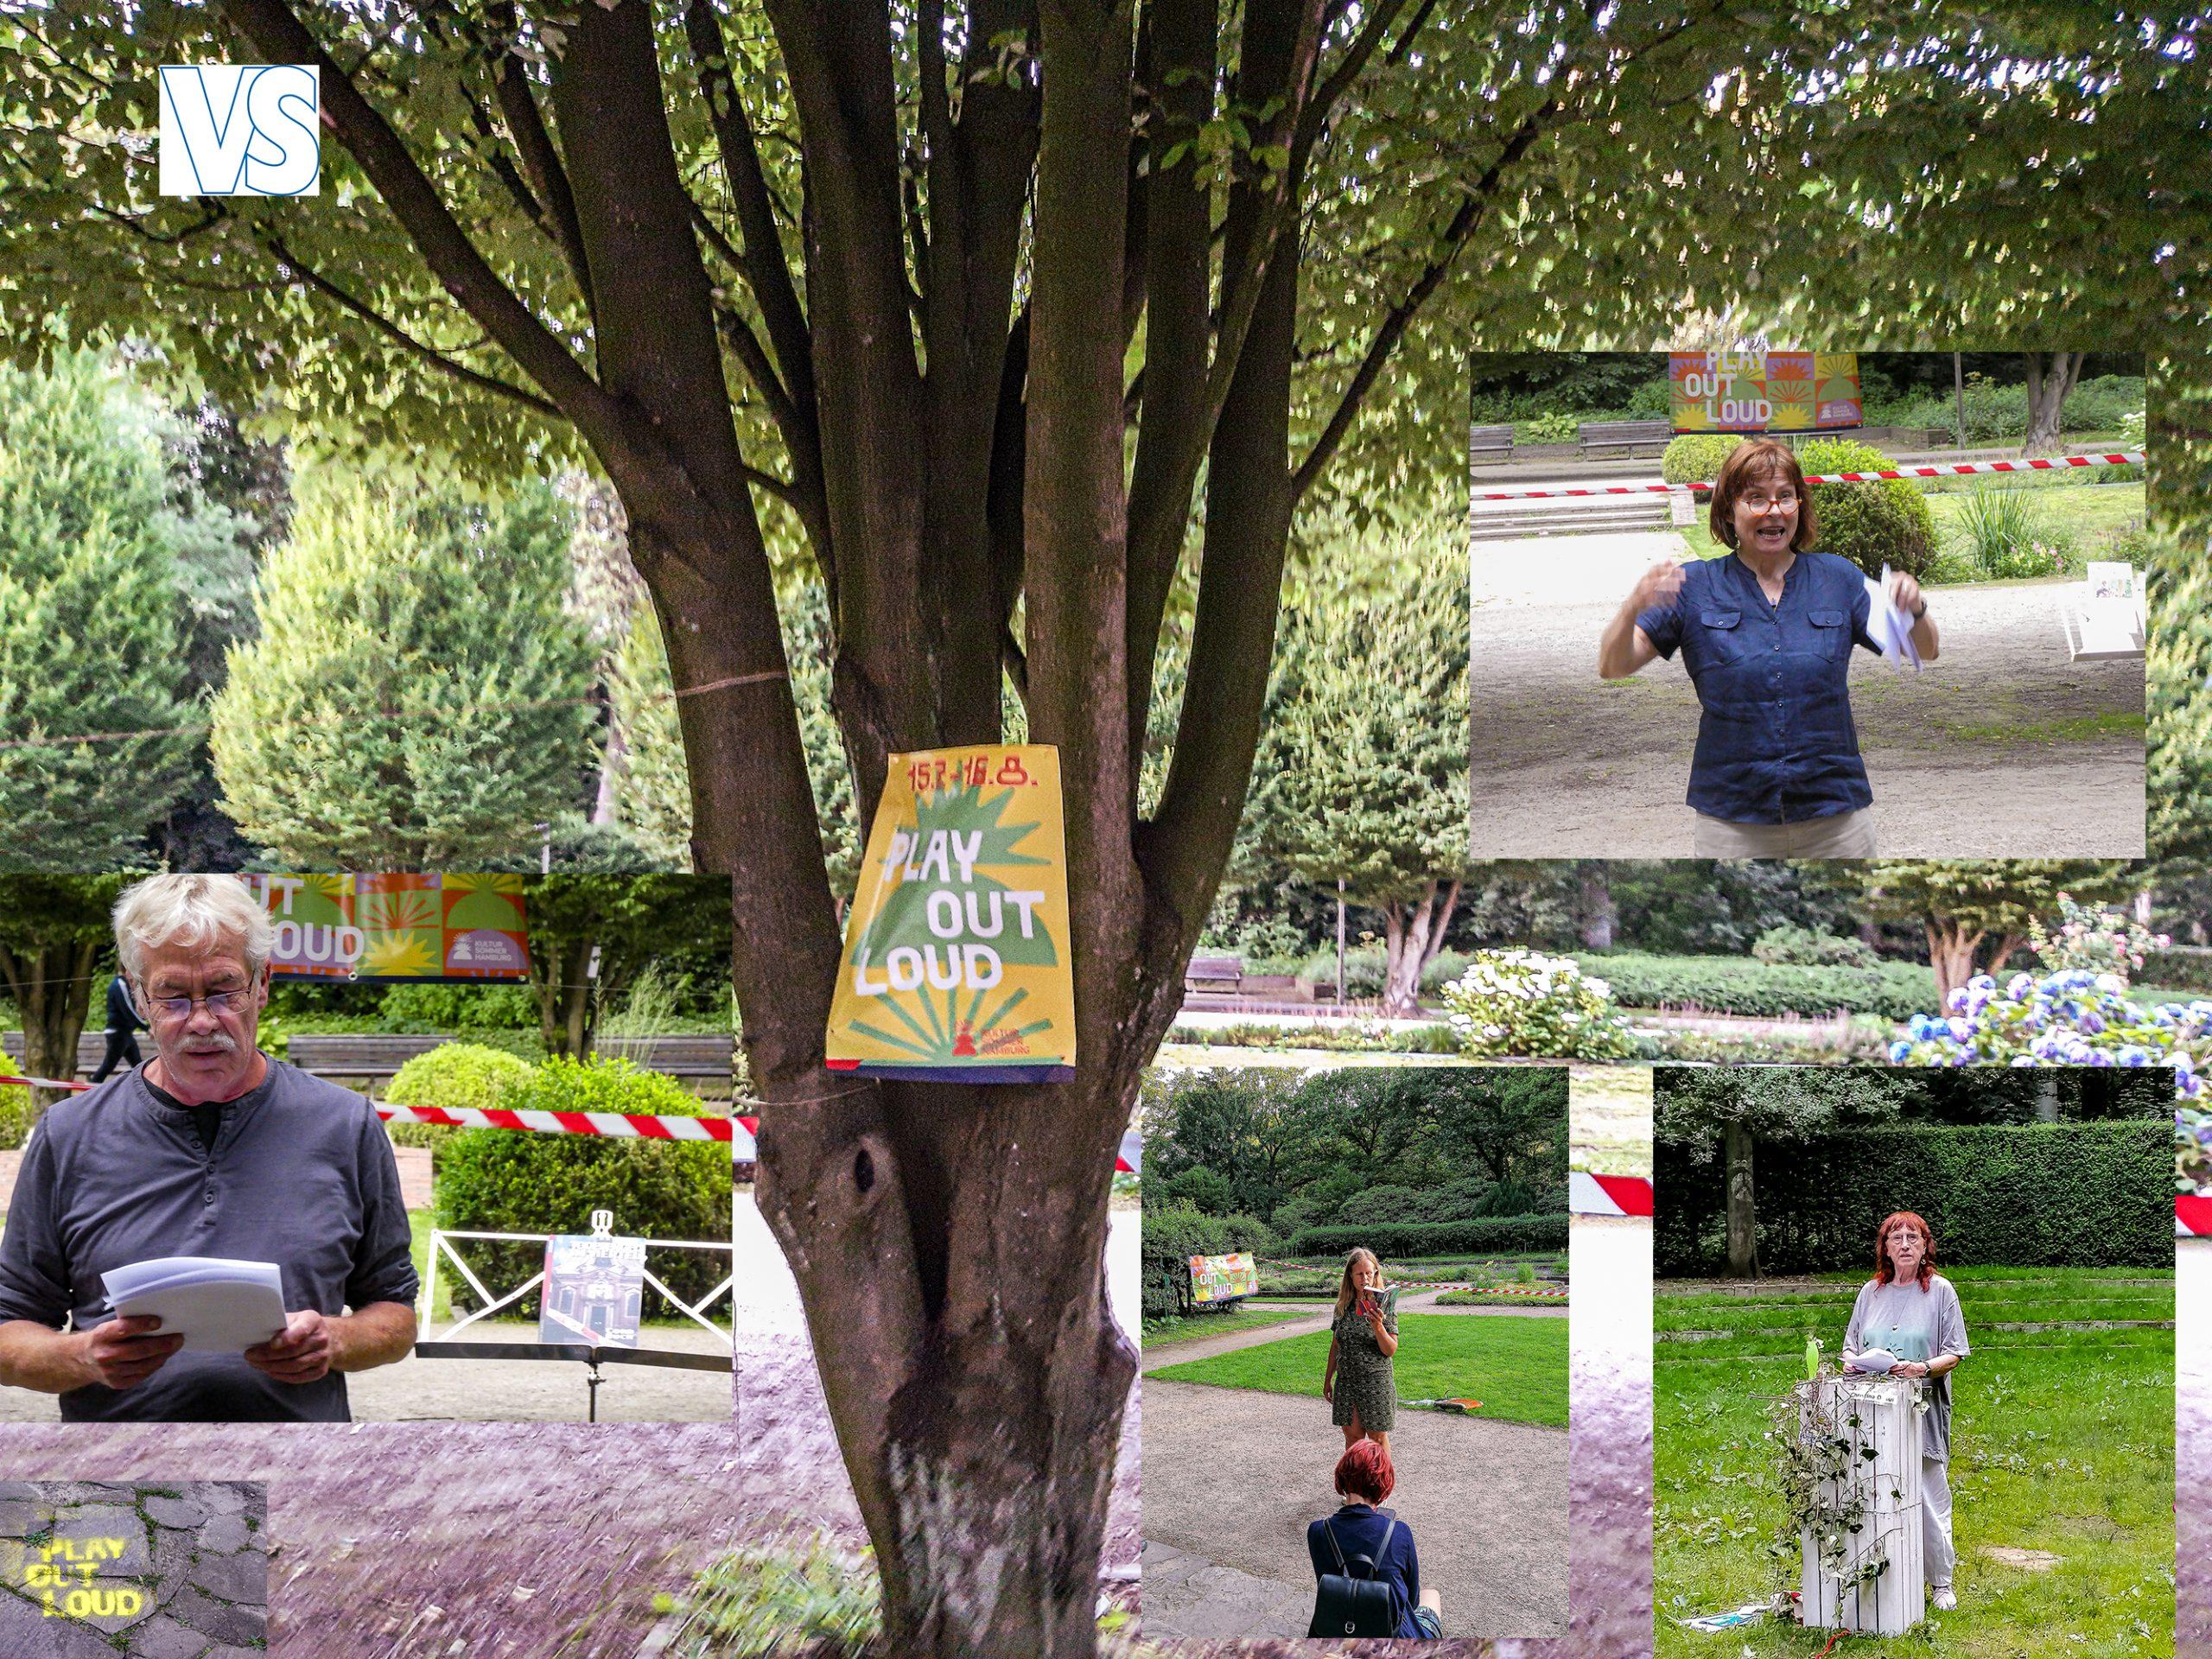 Bild30 collage Plakat Baum 96 fix